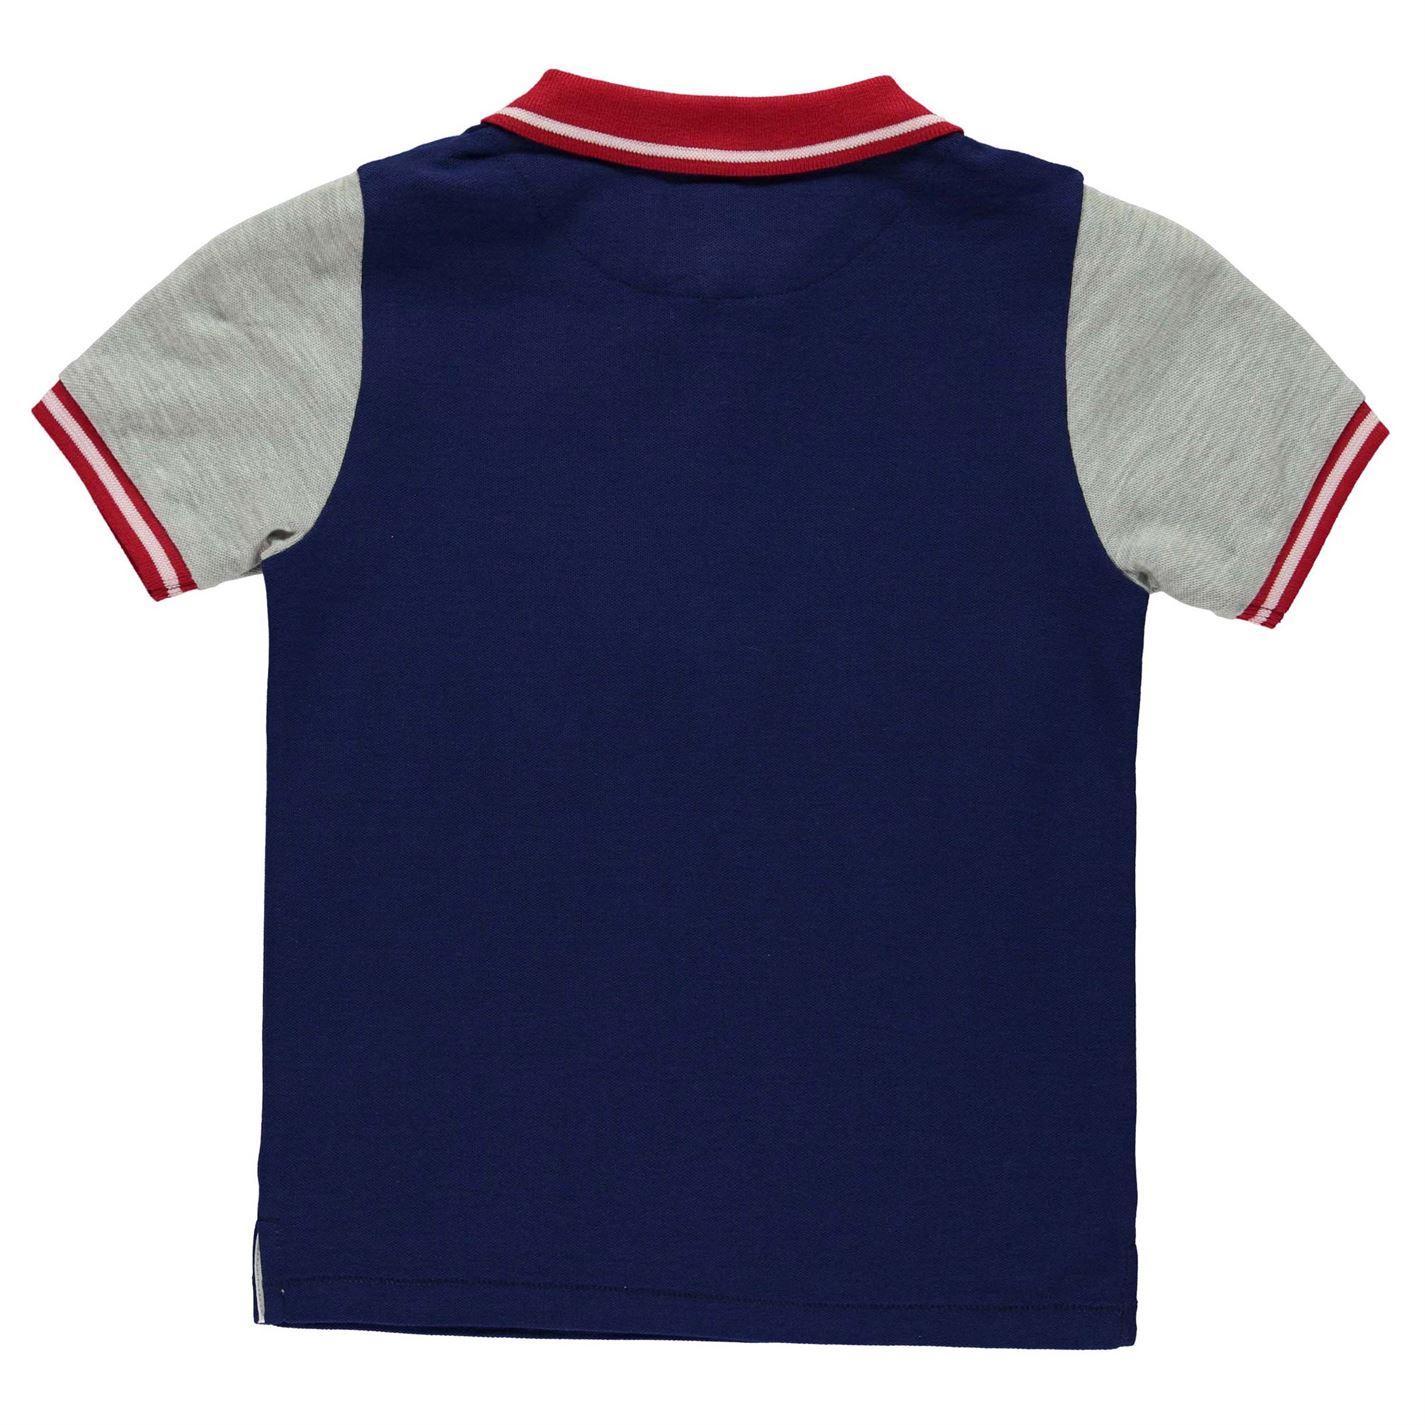 7f6f4e08 Firetrap Kids Polo Shirt Infants Classic Fit Tee Top Short Sleeve ...